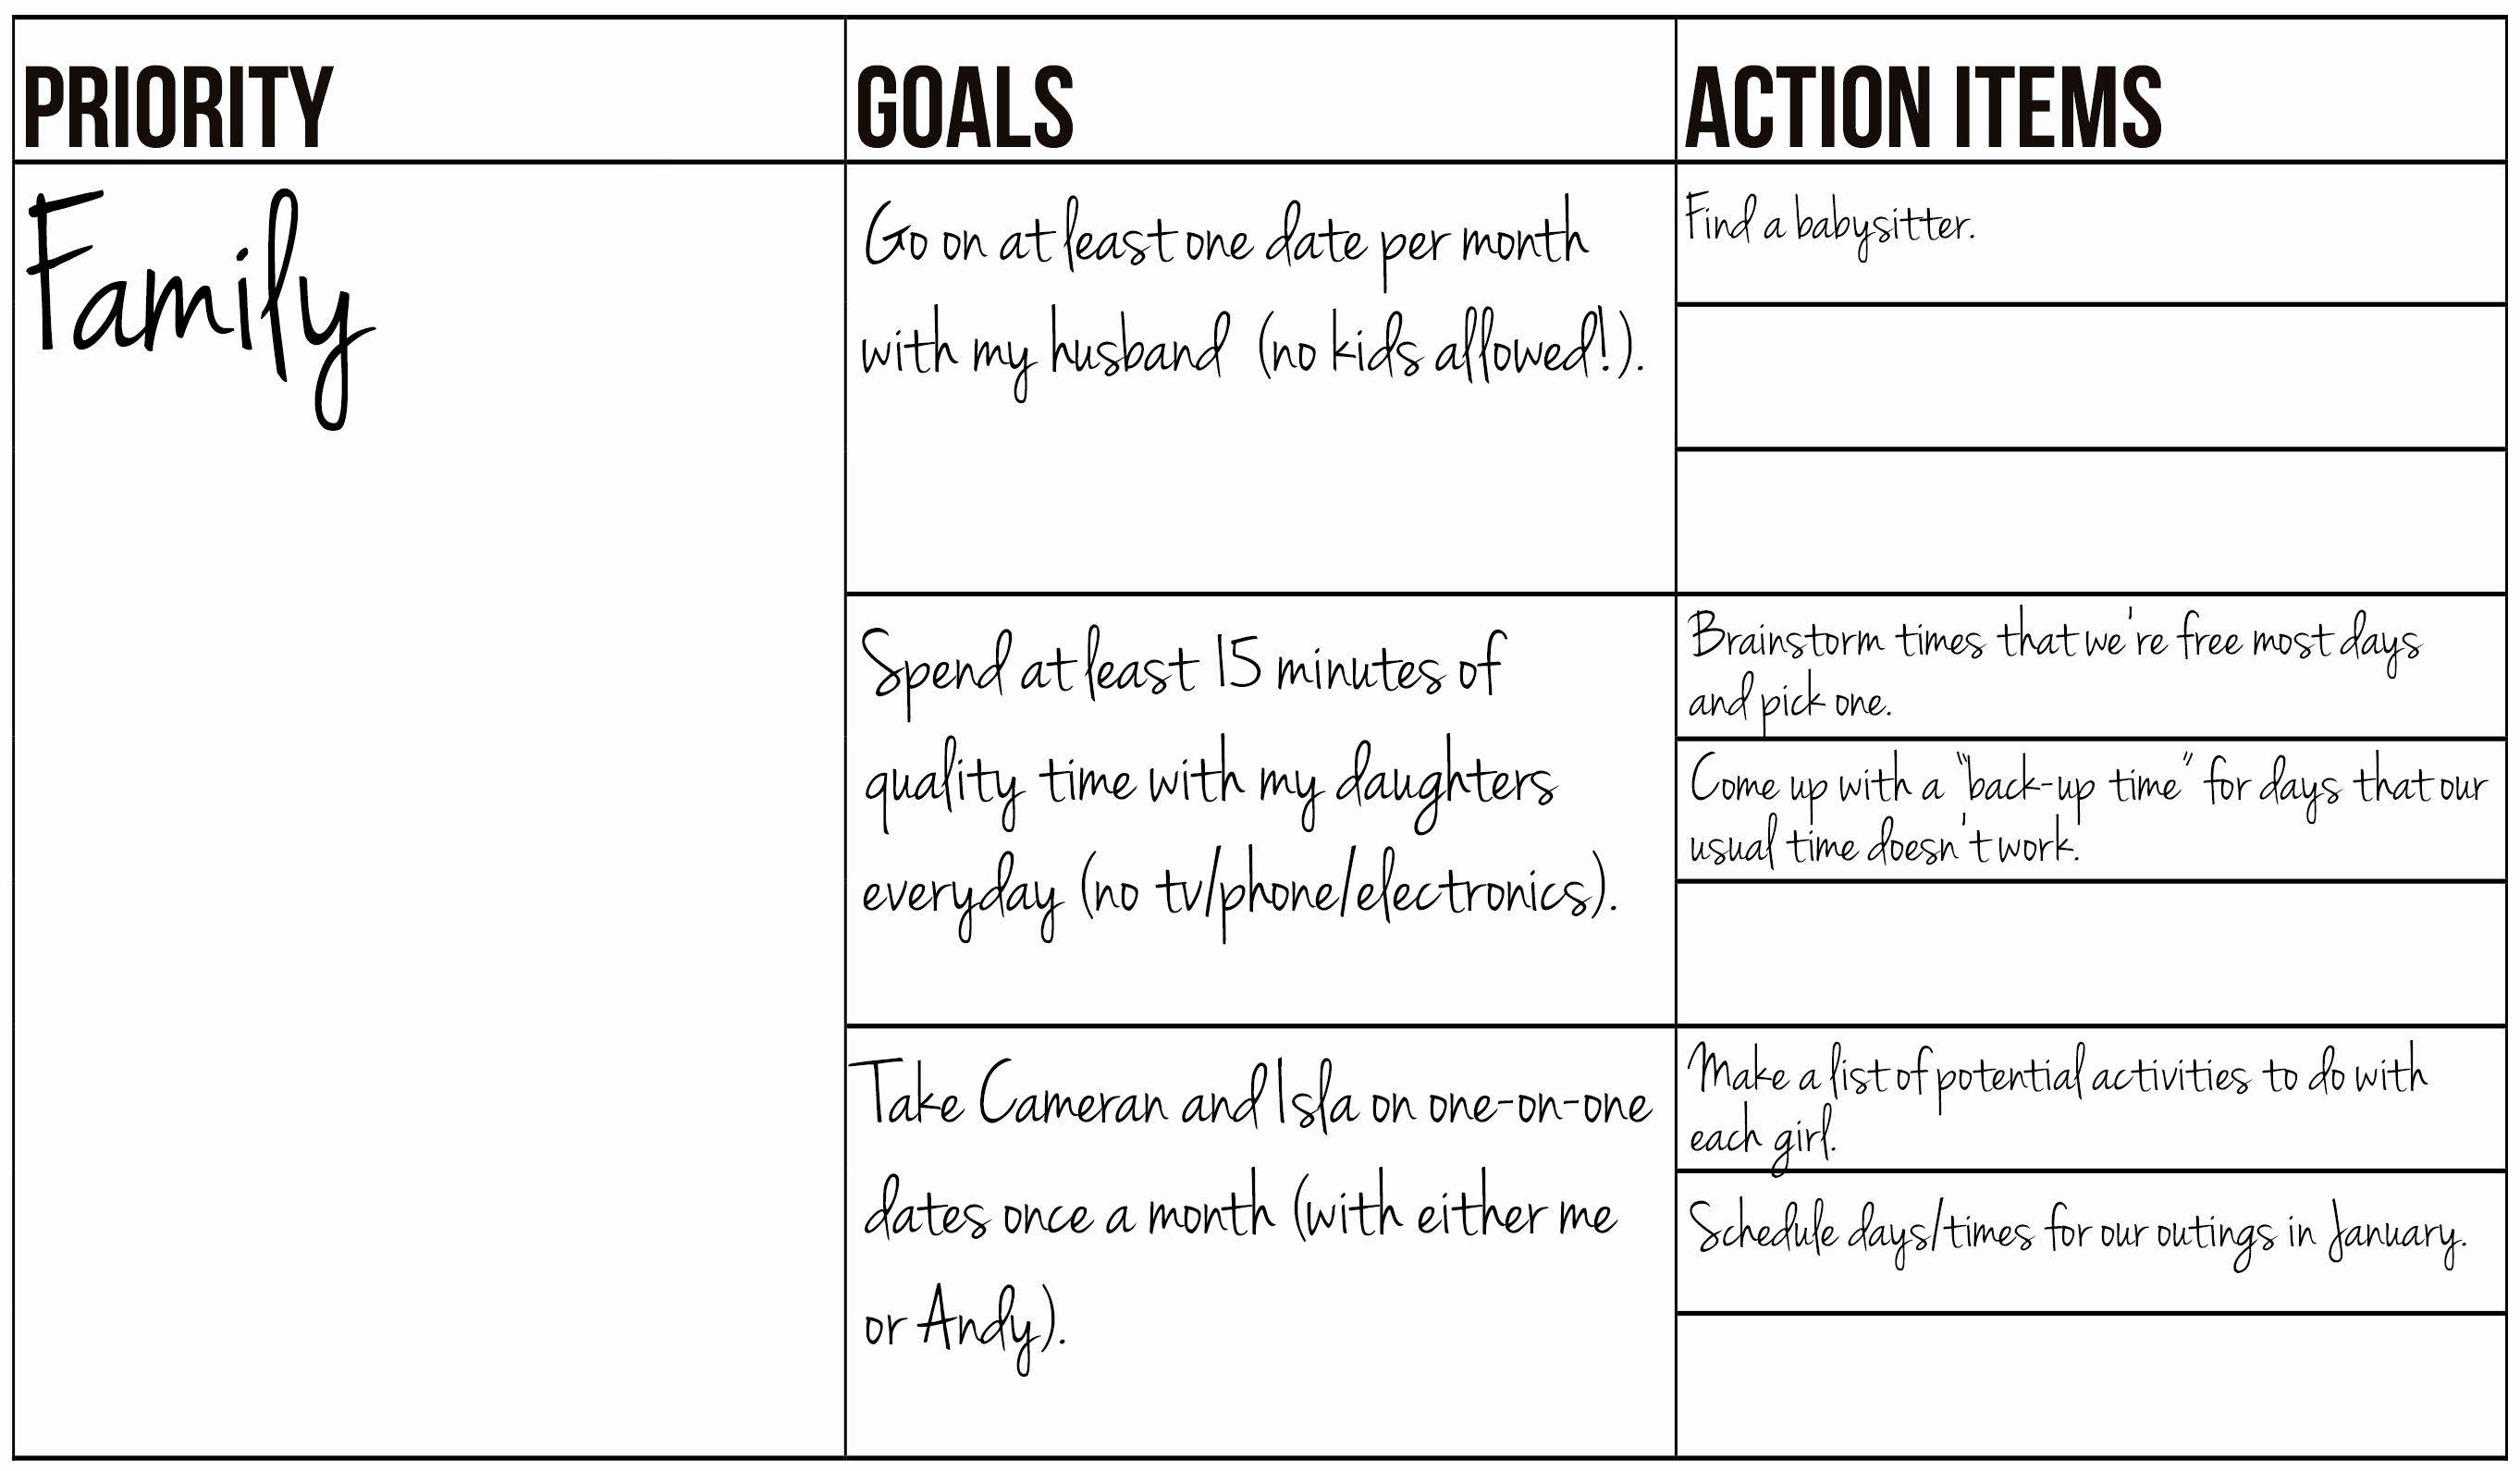 Personal Wellness Plan Template New Free Printable Goal